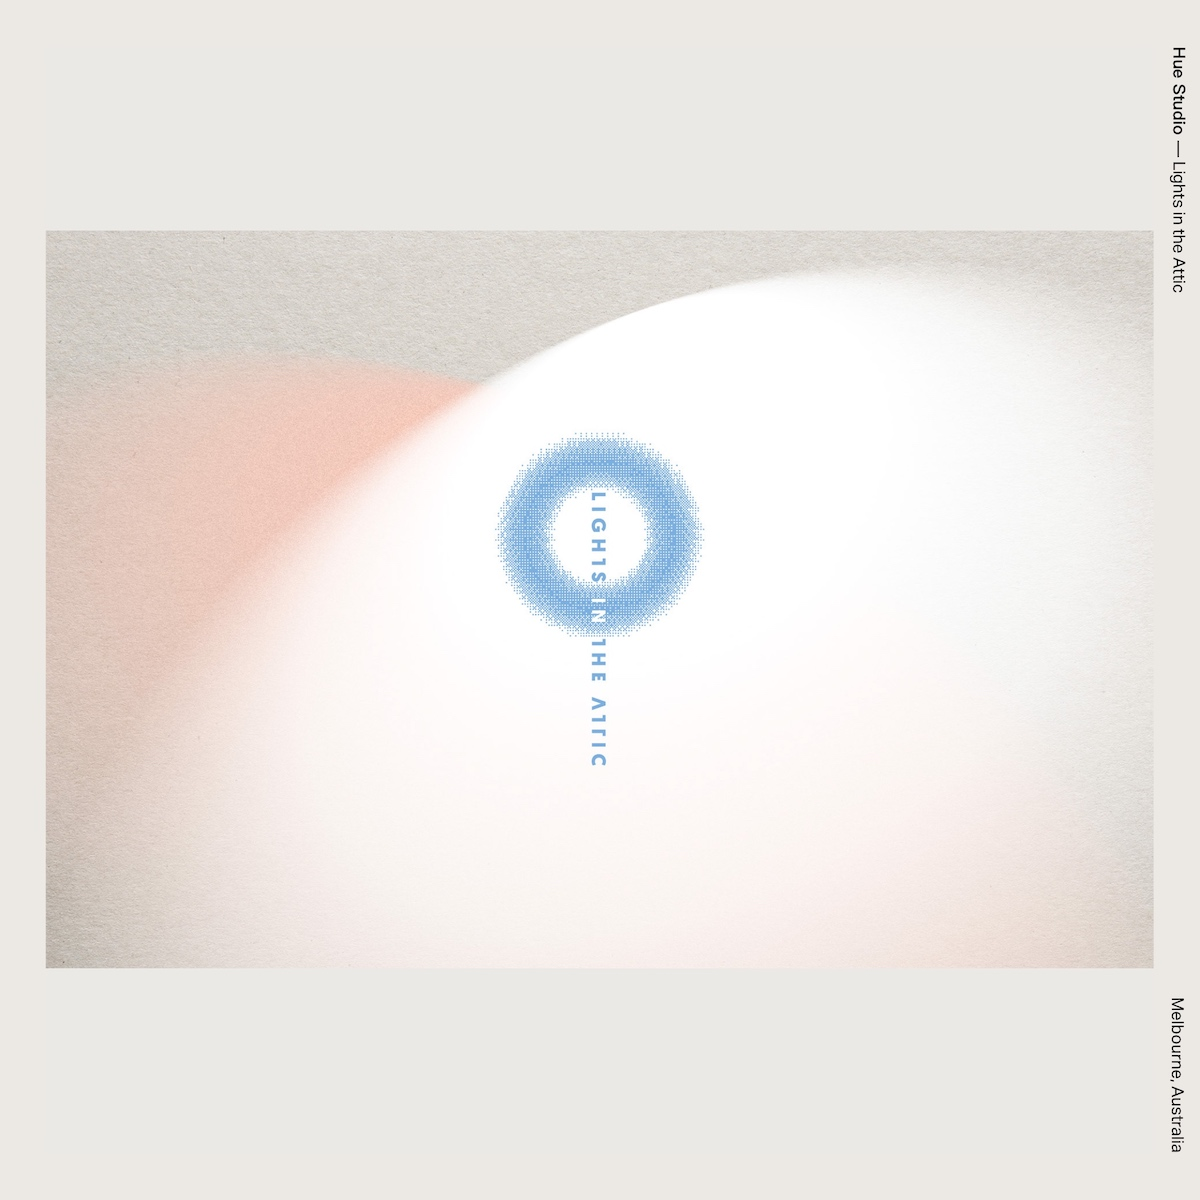 Hue Studio — Lights in the Attic